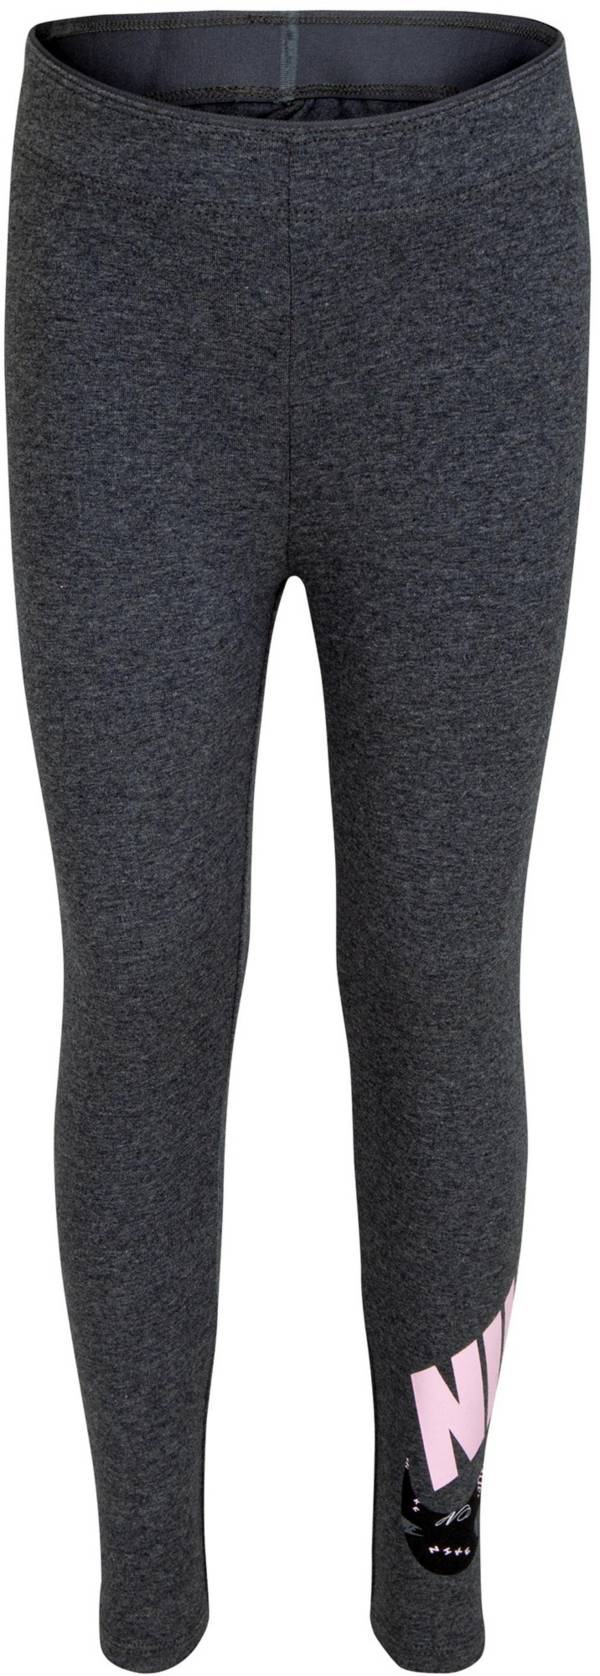 Nike Little Girls' Icon Clash Favorites Leggings product image